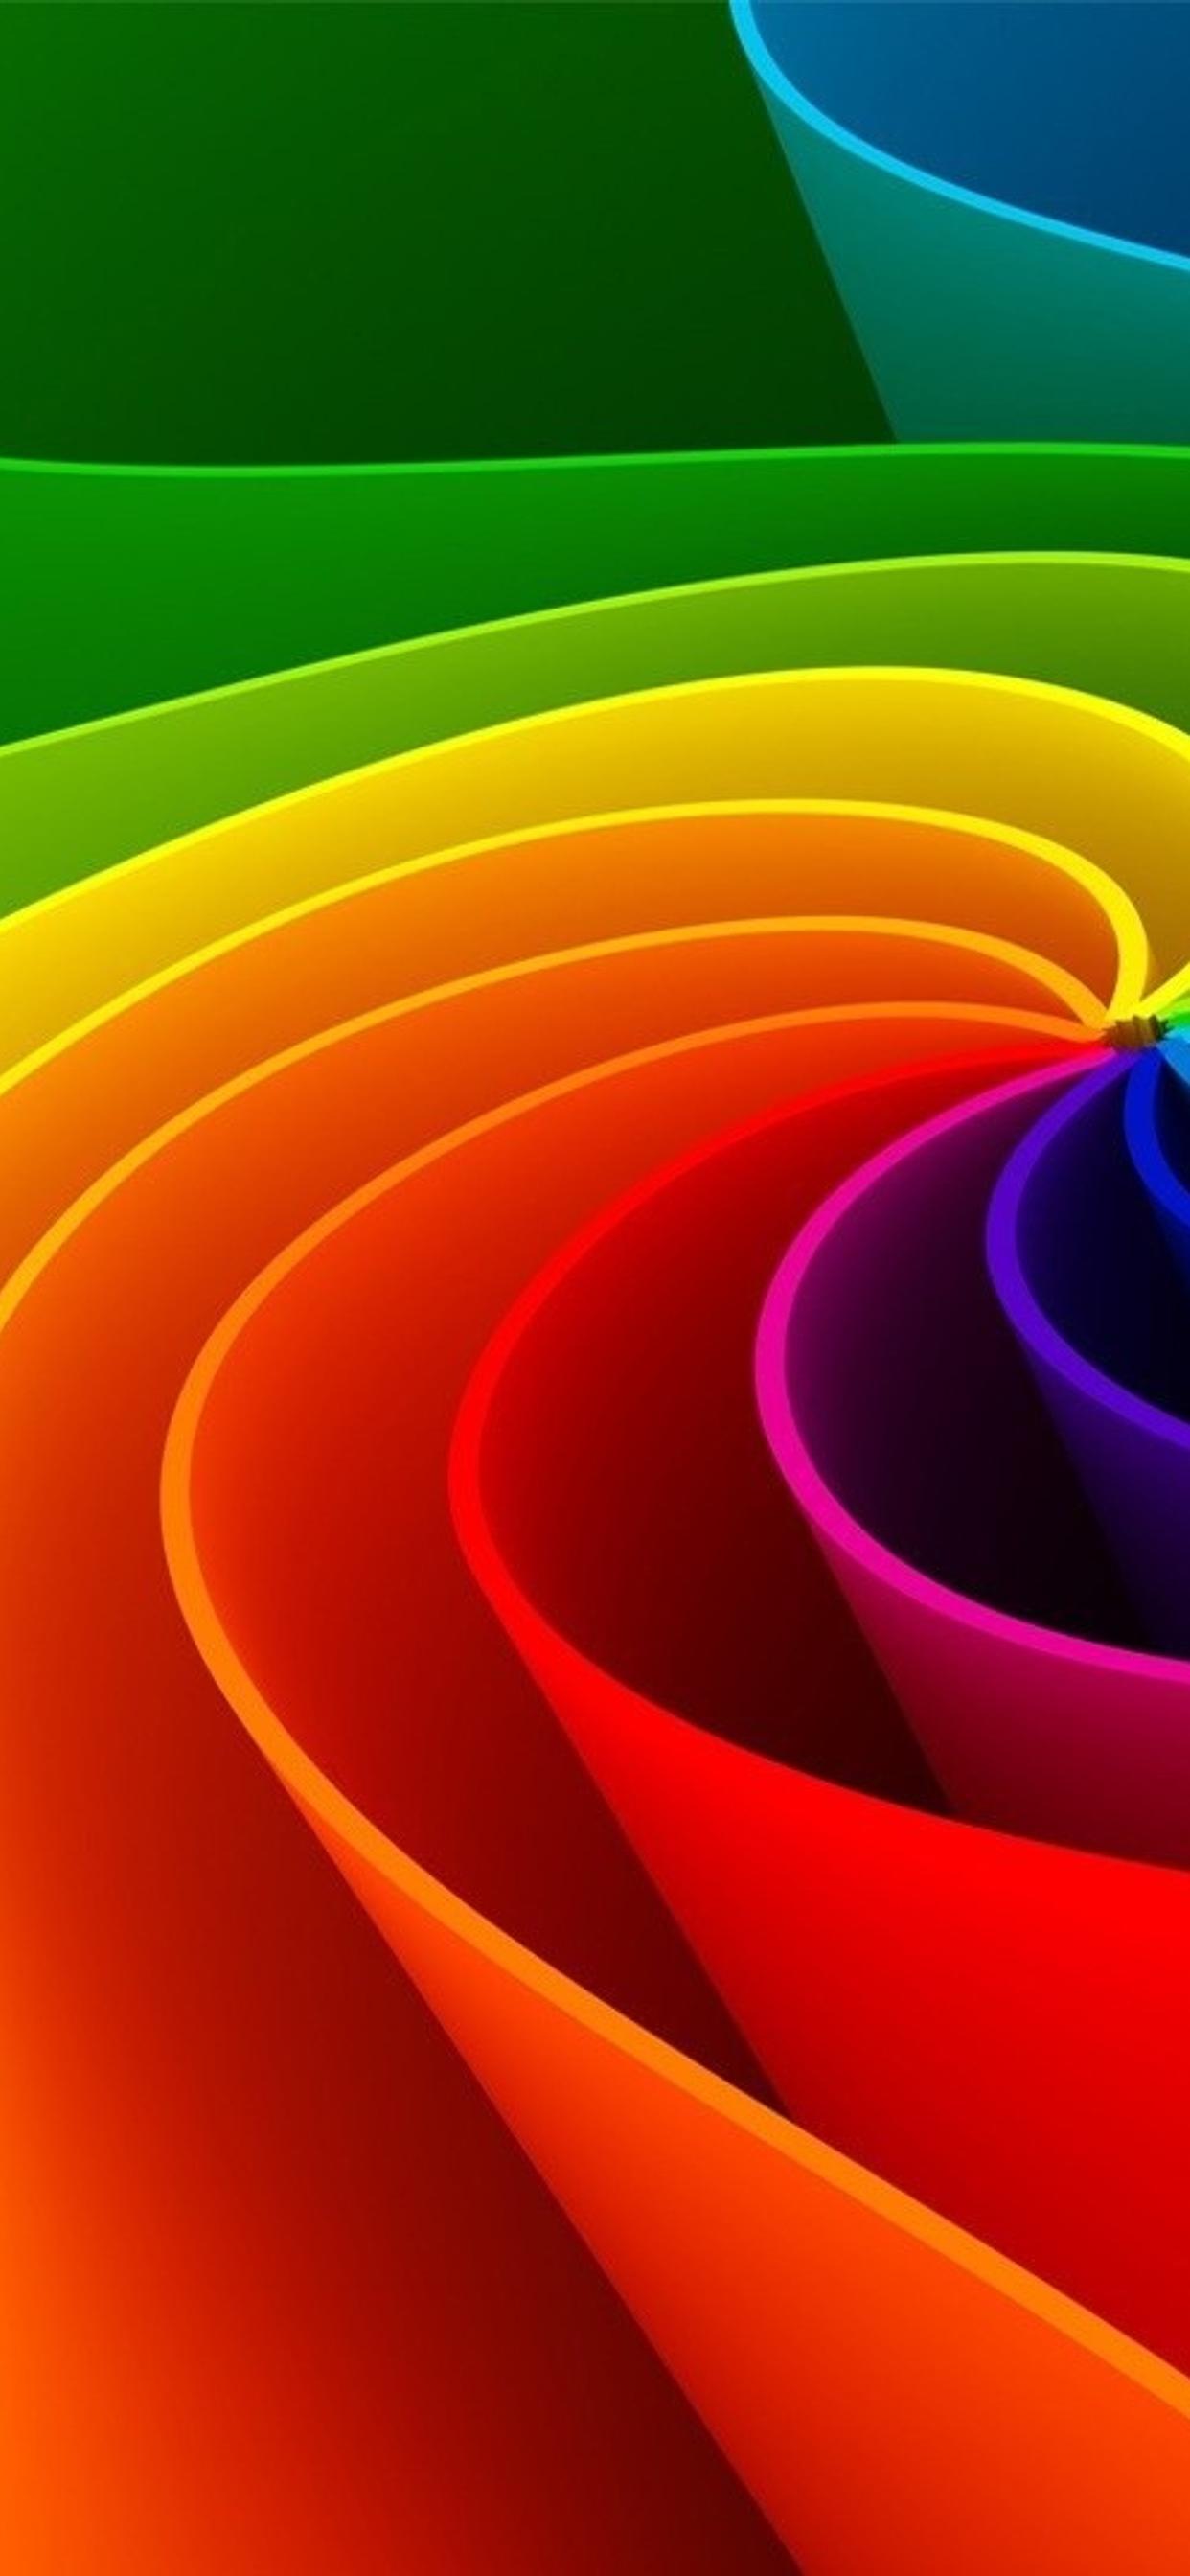 Rainbow Paper Shapes Hd Wonderful Wallpaper